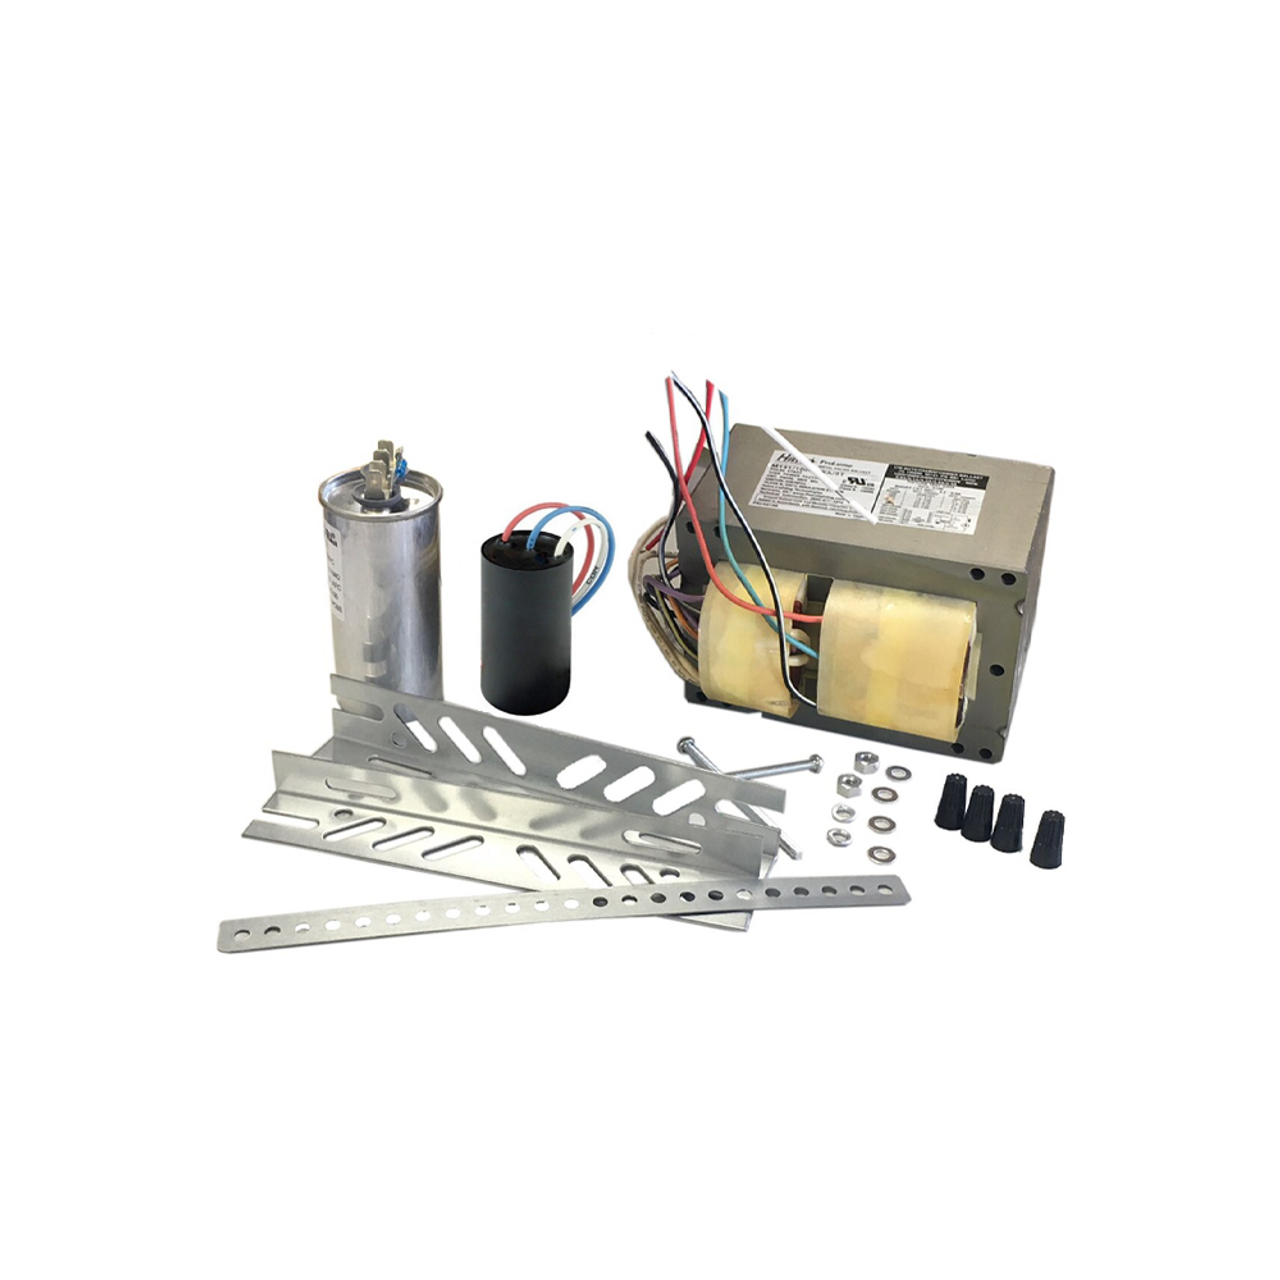 4 6-Pack Halco EP432IS//MV//MC Fluorescent 120//277V Ballast for F32T8 Lamps